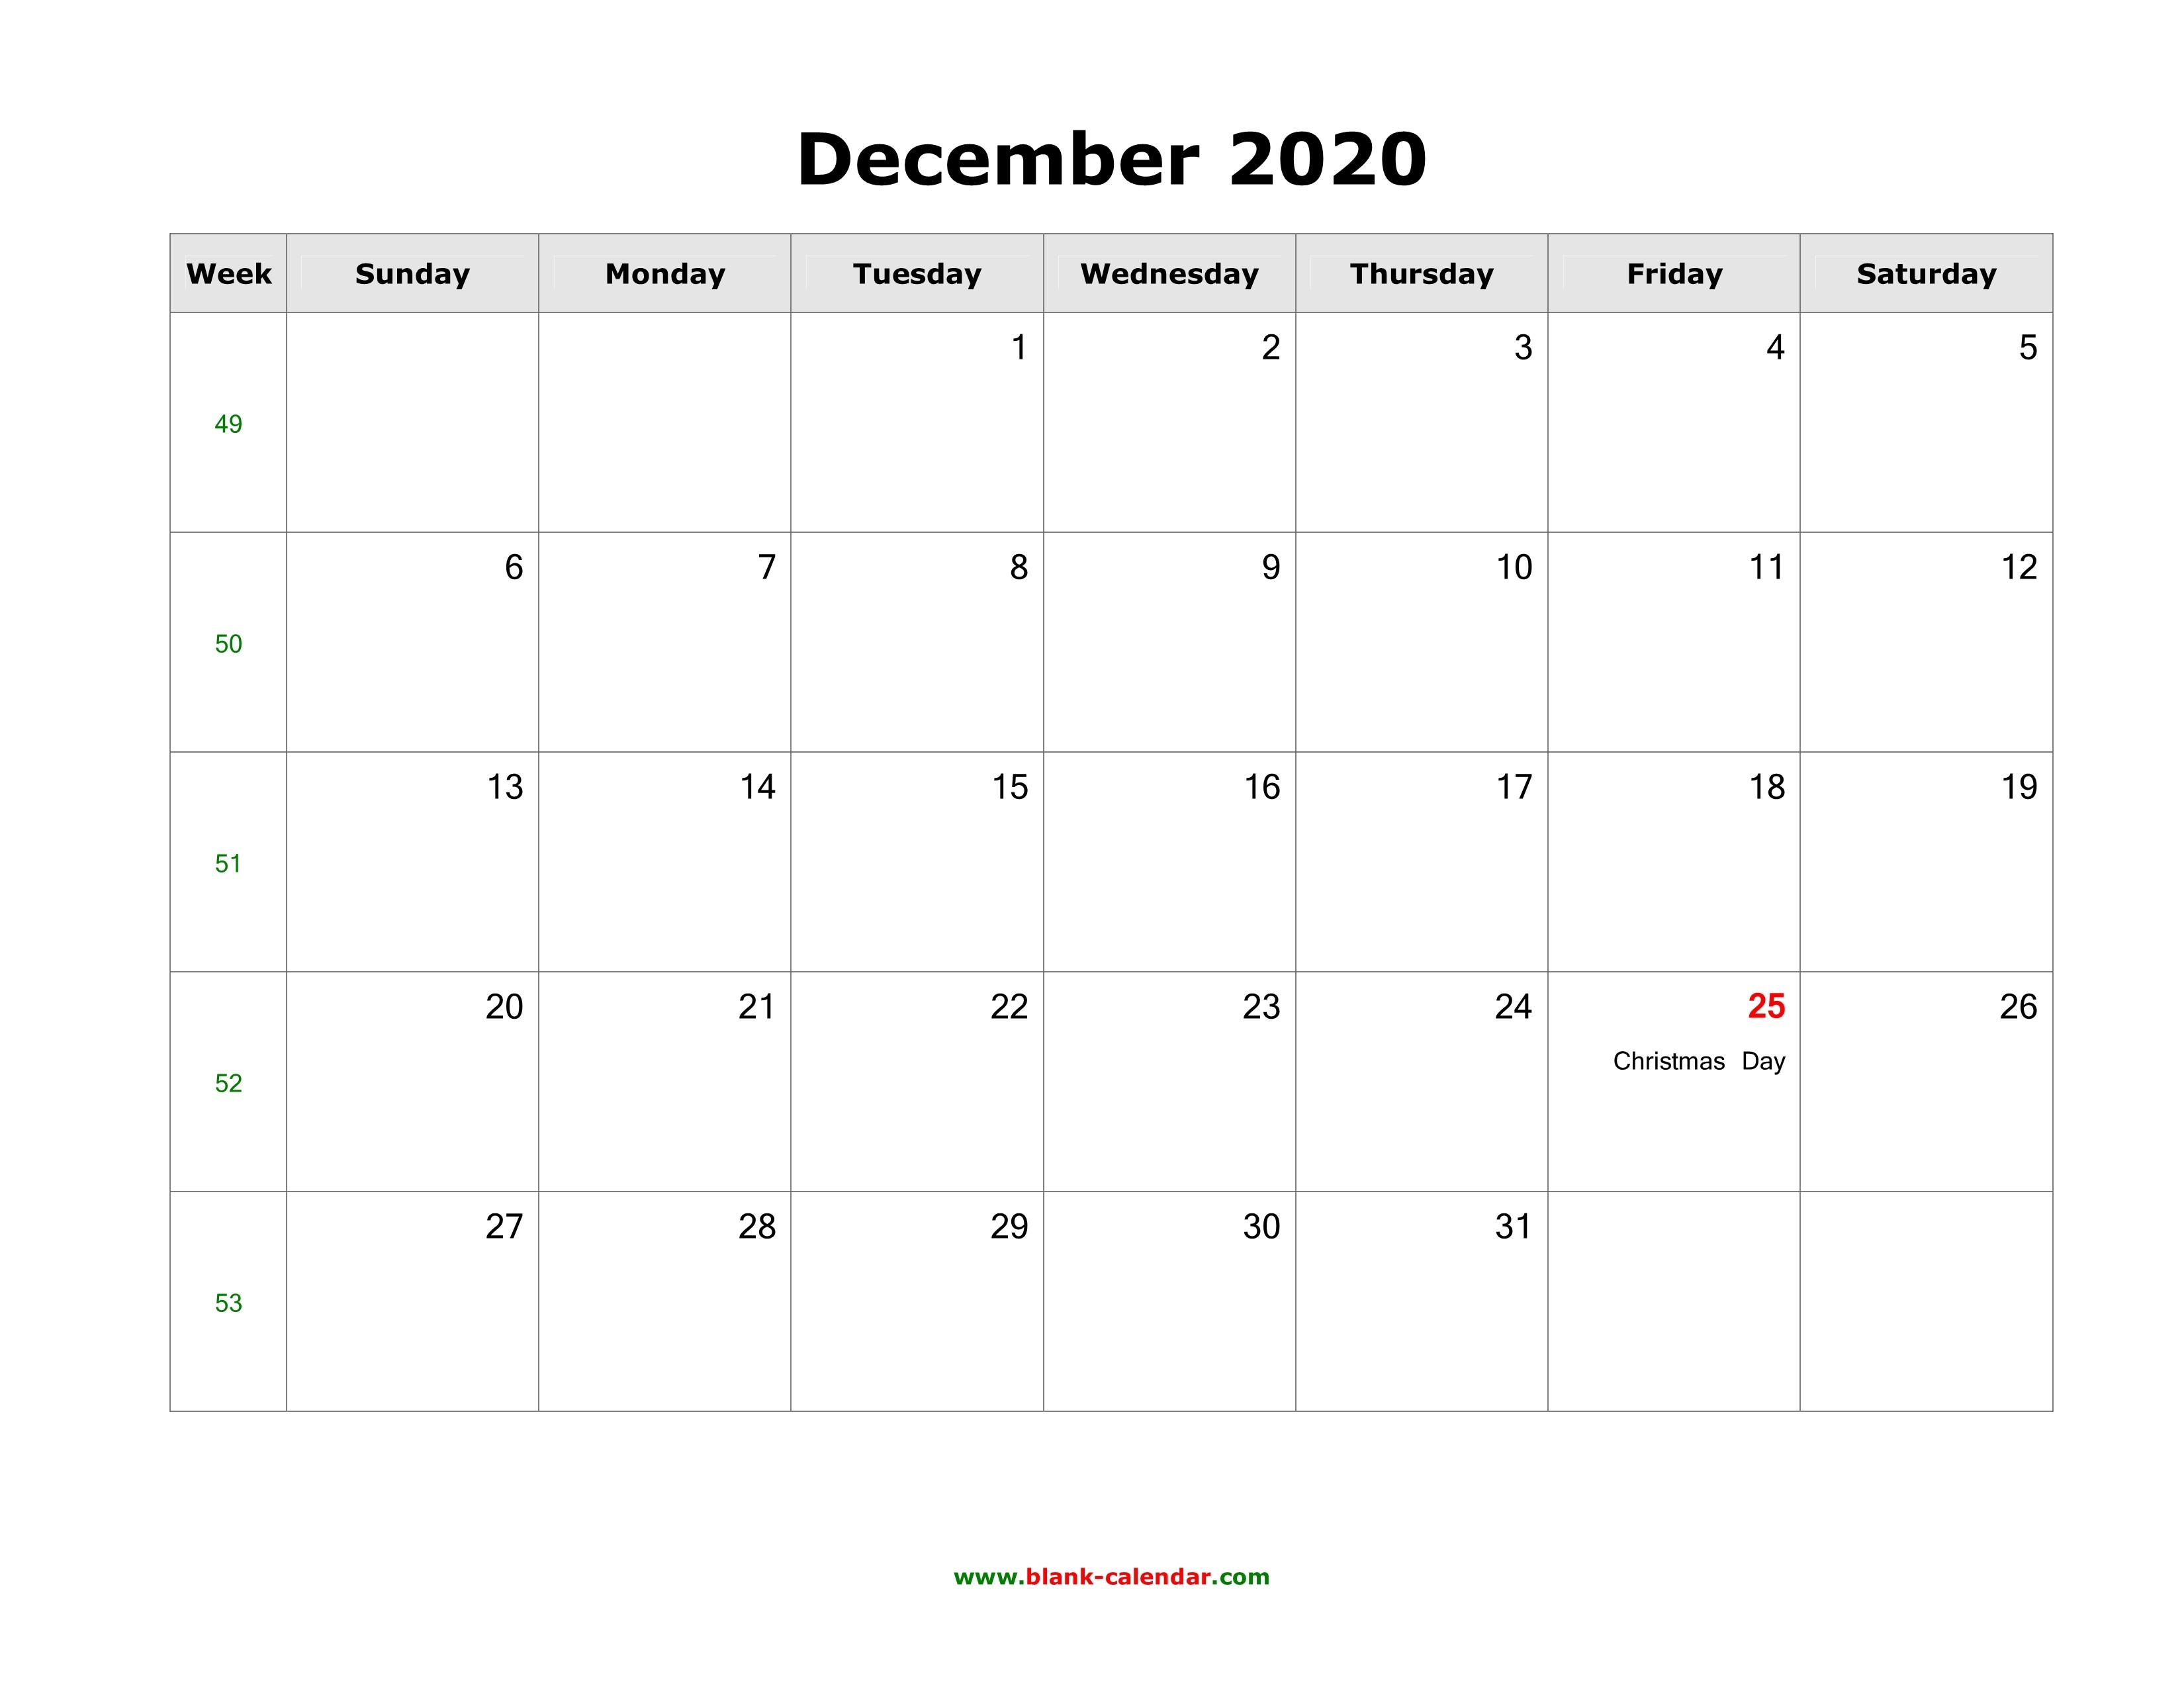 December 2020 Printable Calendar December 2020 Blank Calendar